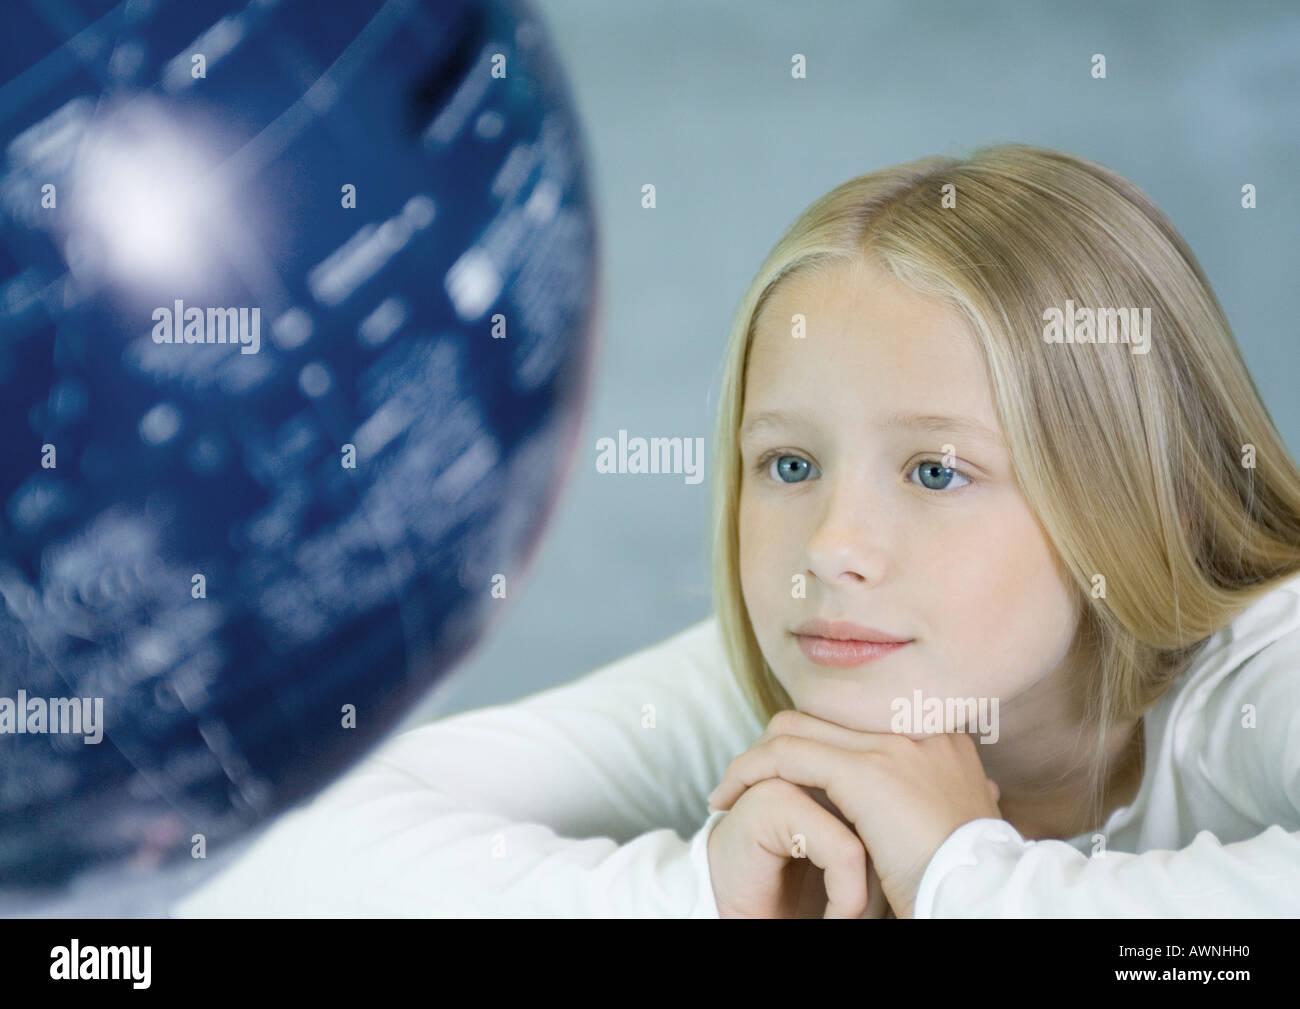 Girl looking at globe - Stock Image